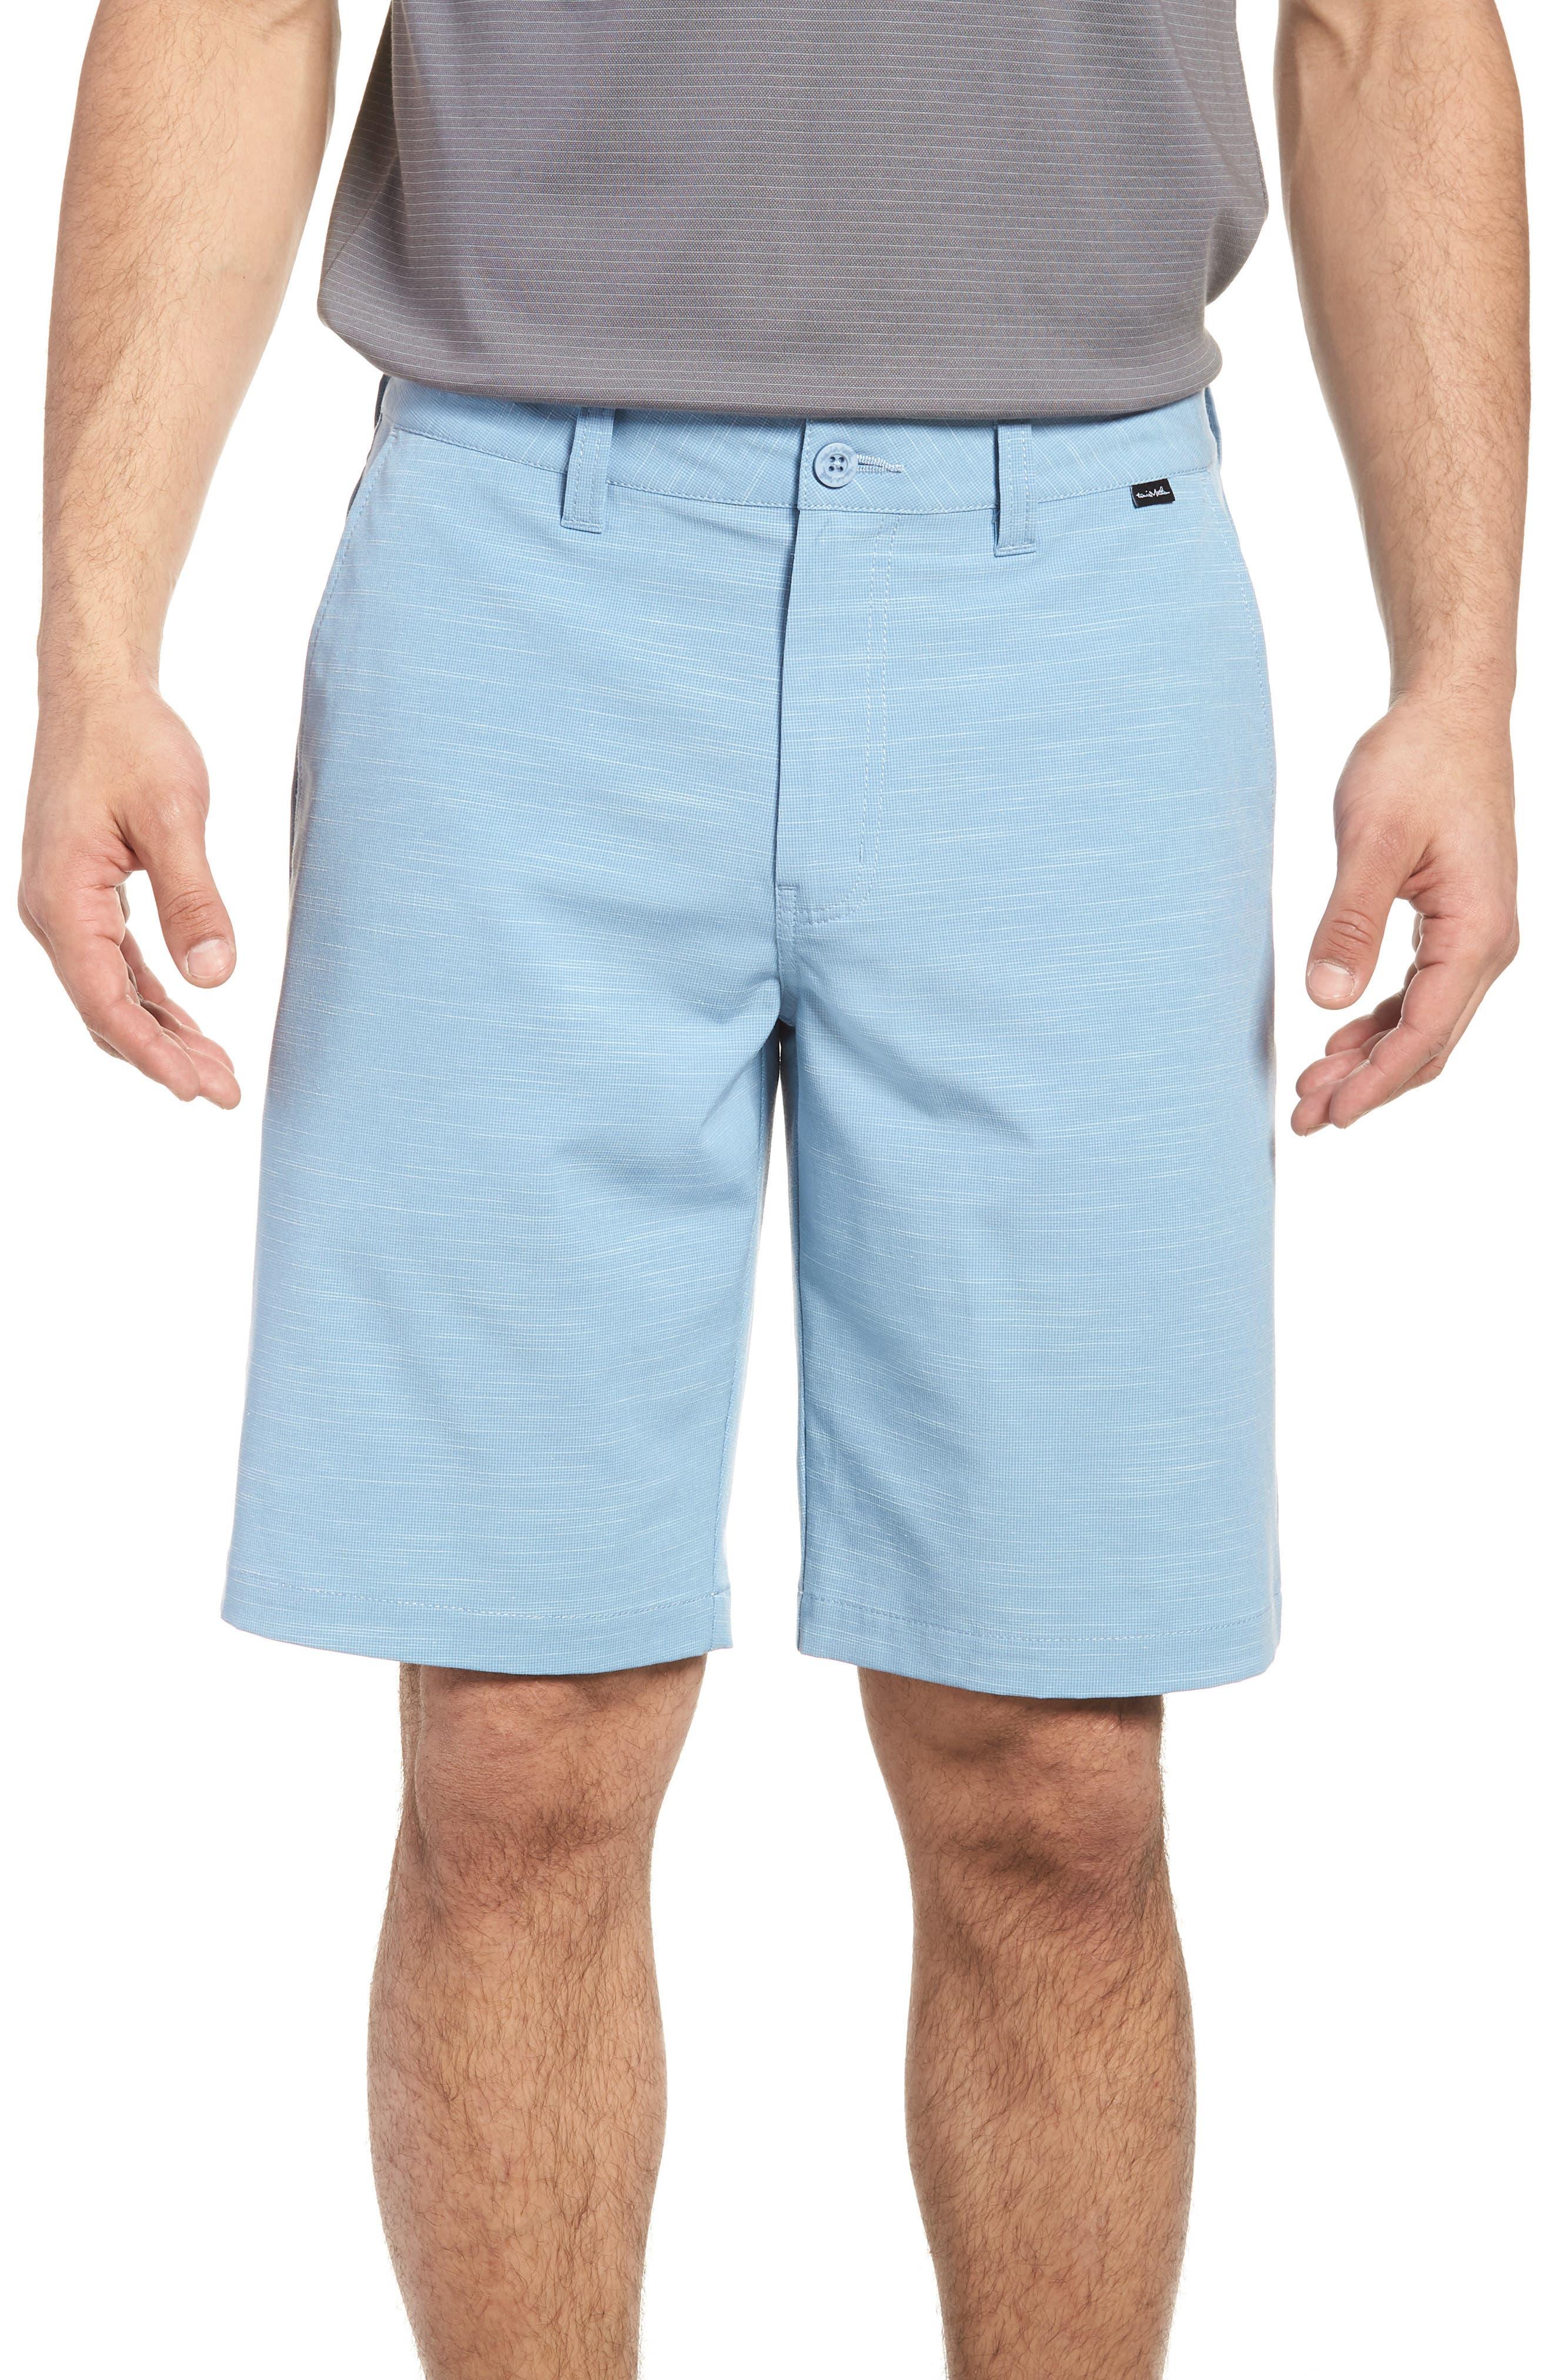 Templo Shorts,                         Main,                         color, 400